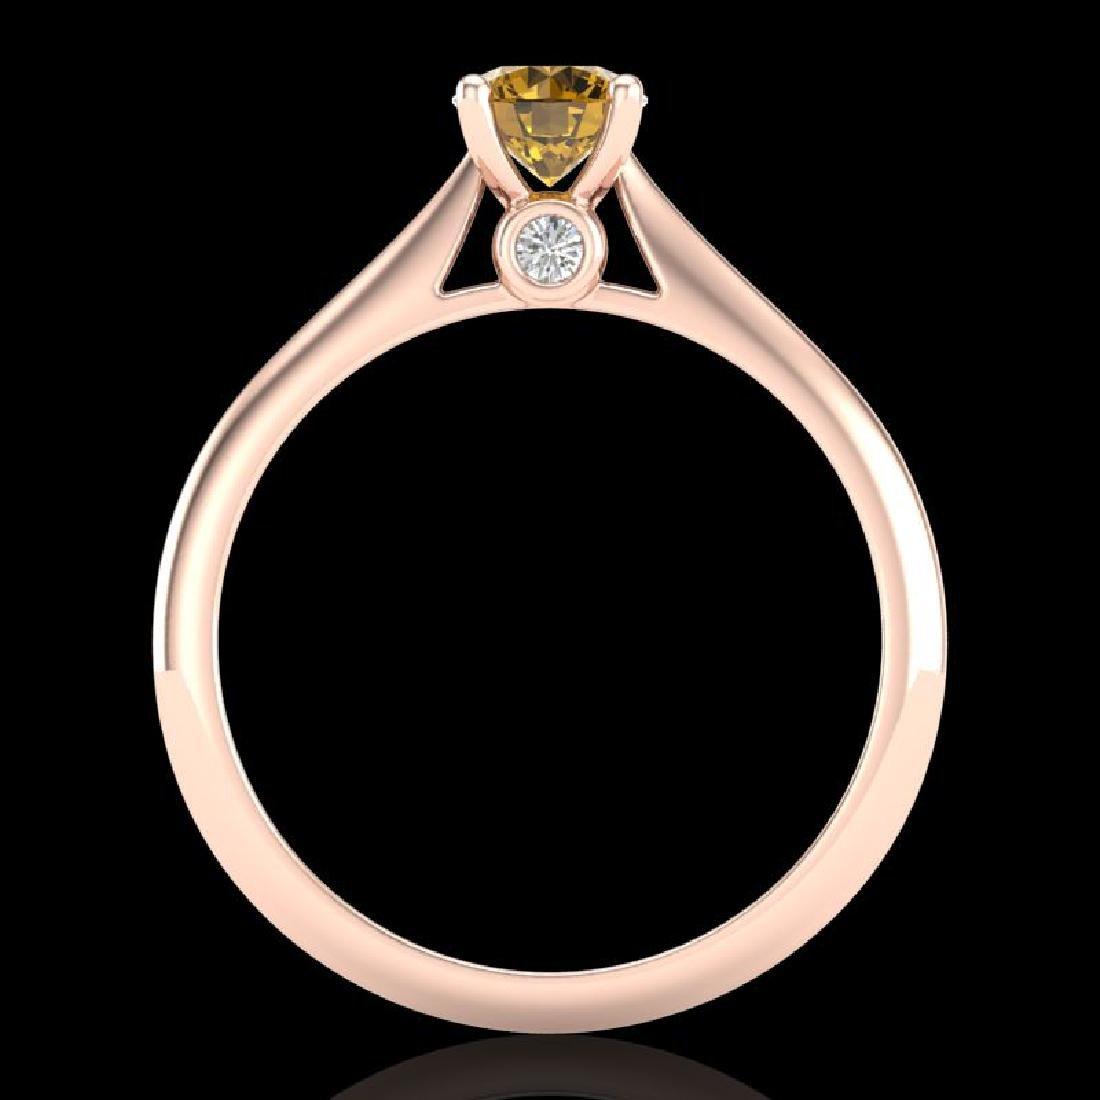 0.56 CTW Intense Fancy Yellow Diamond Engagement Art - 3